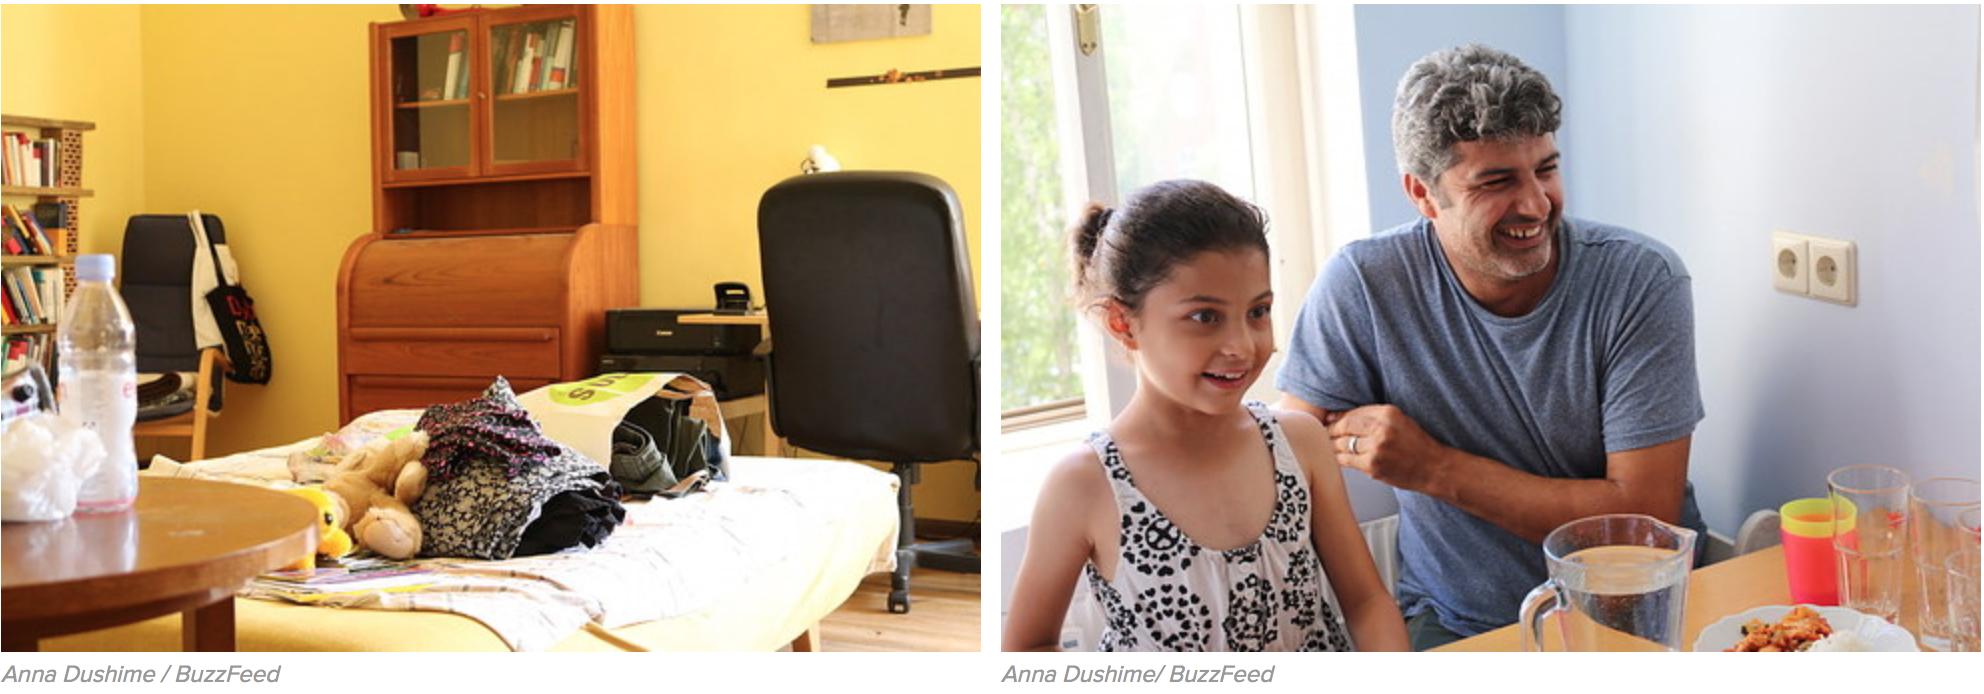 labananequiparle-refugies-syriens-temoignage-hollande-8